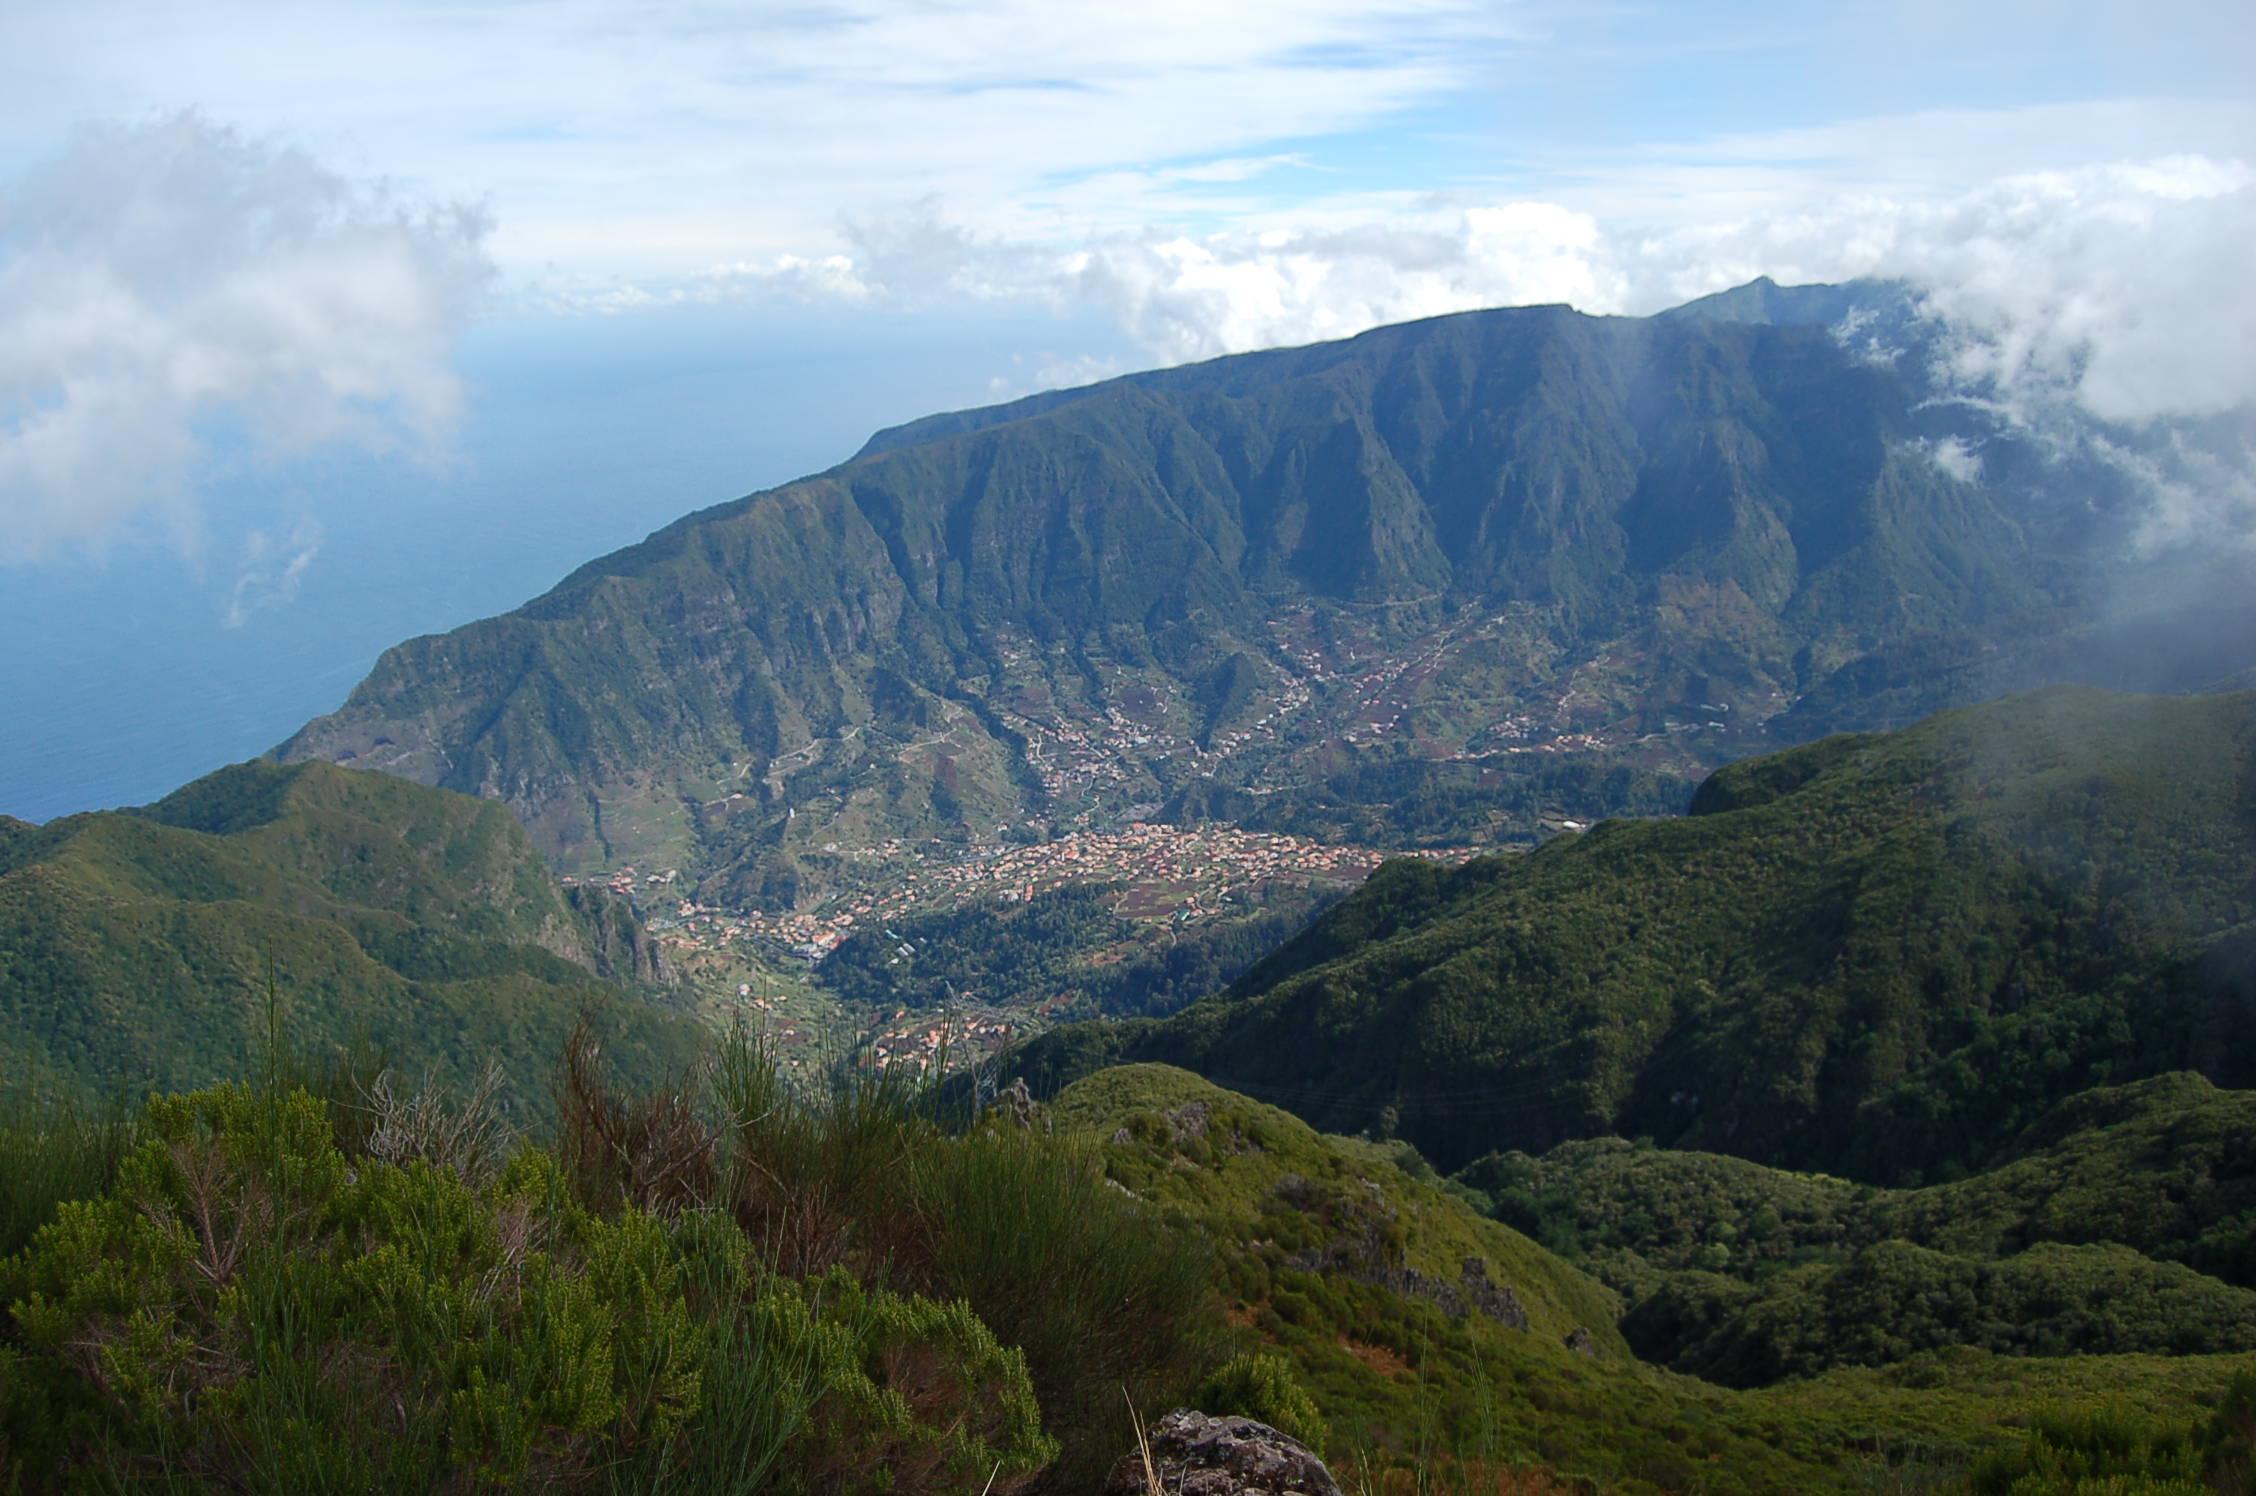 freude-am-sein/Madeira-Farbe bewegen/Retreat